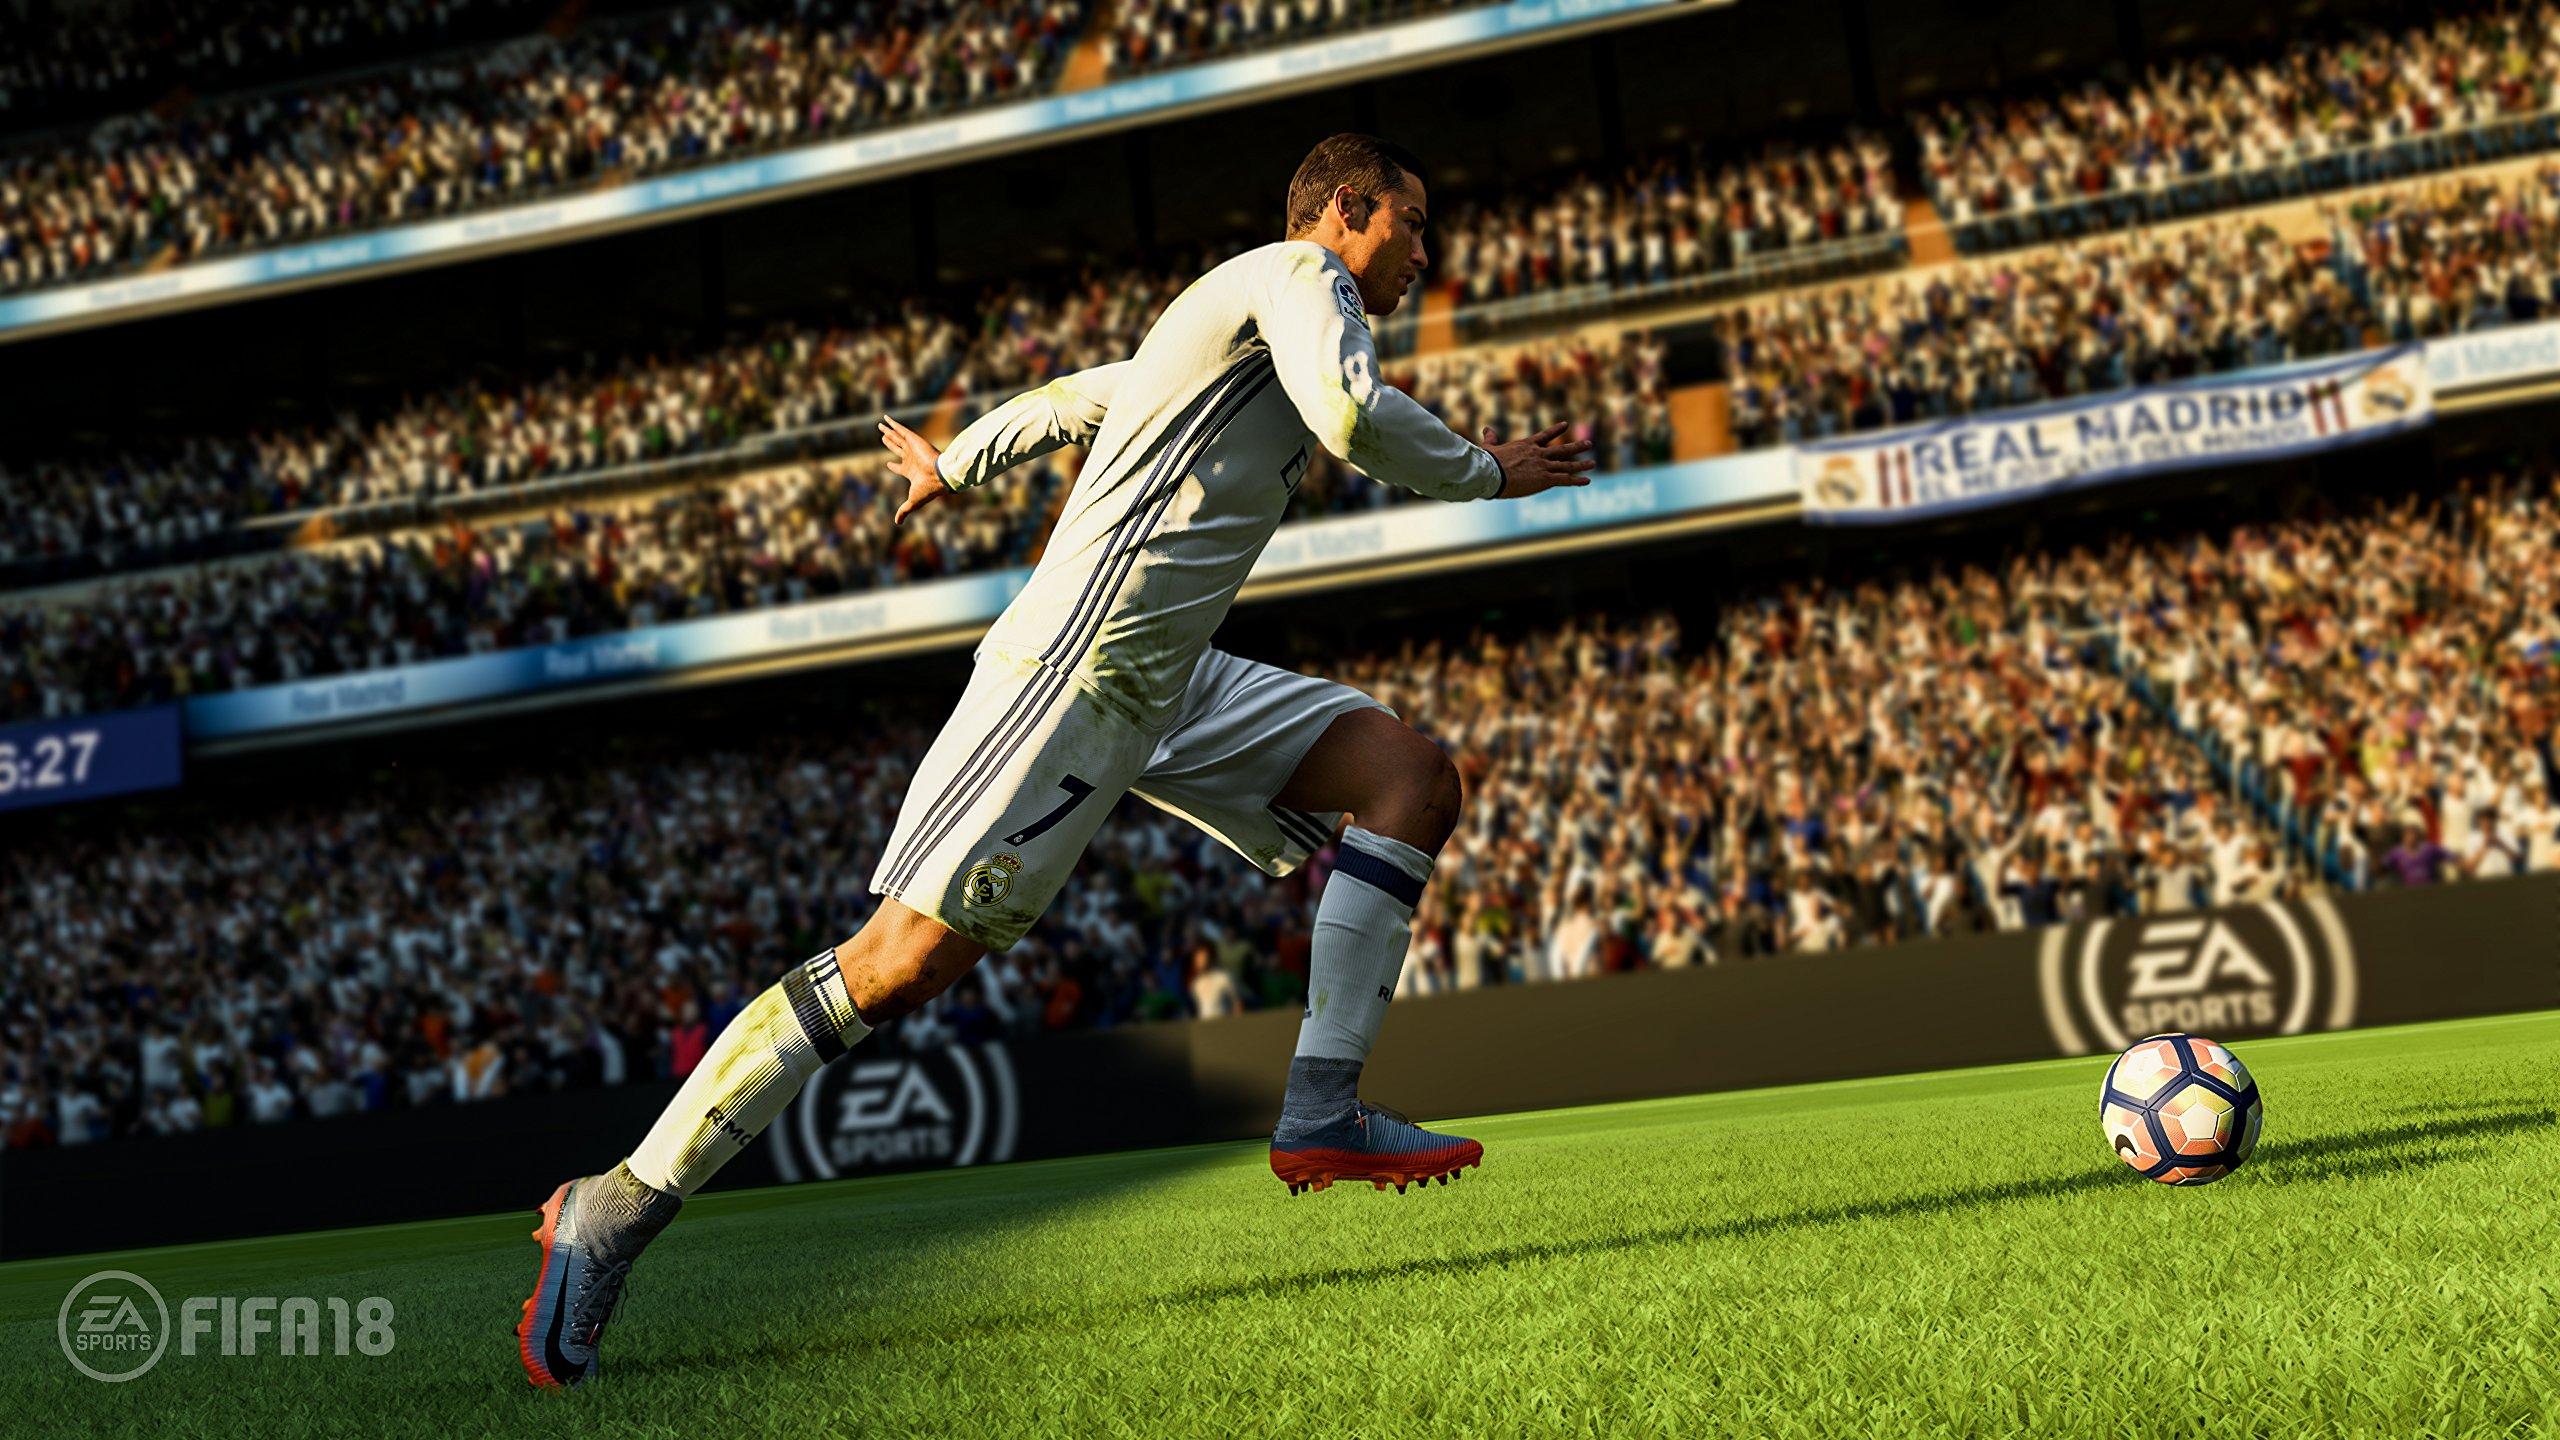 Amazon FIFA 18 Icon Edition